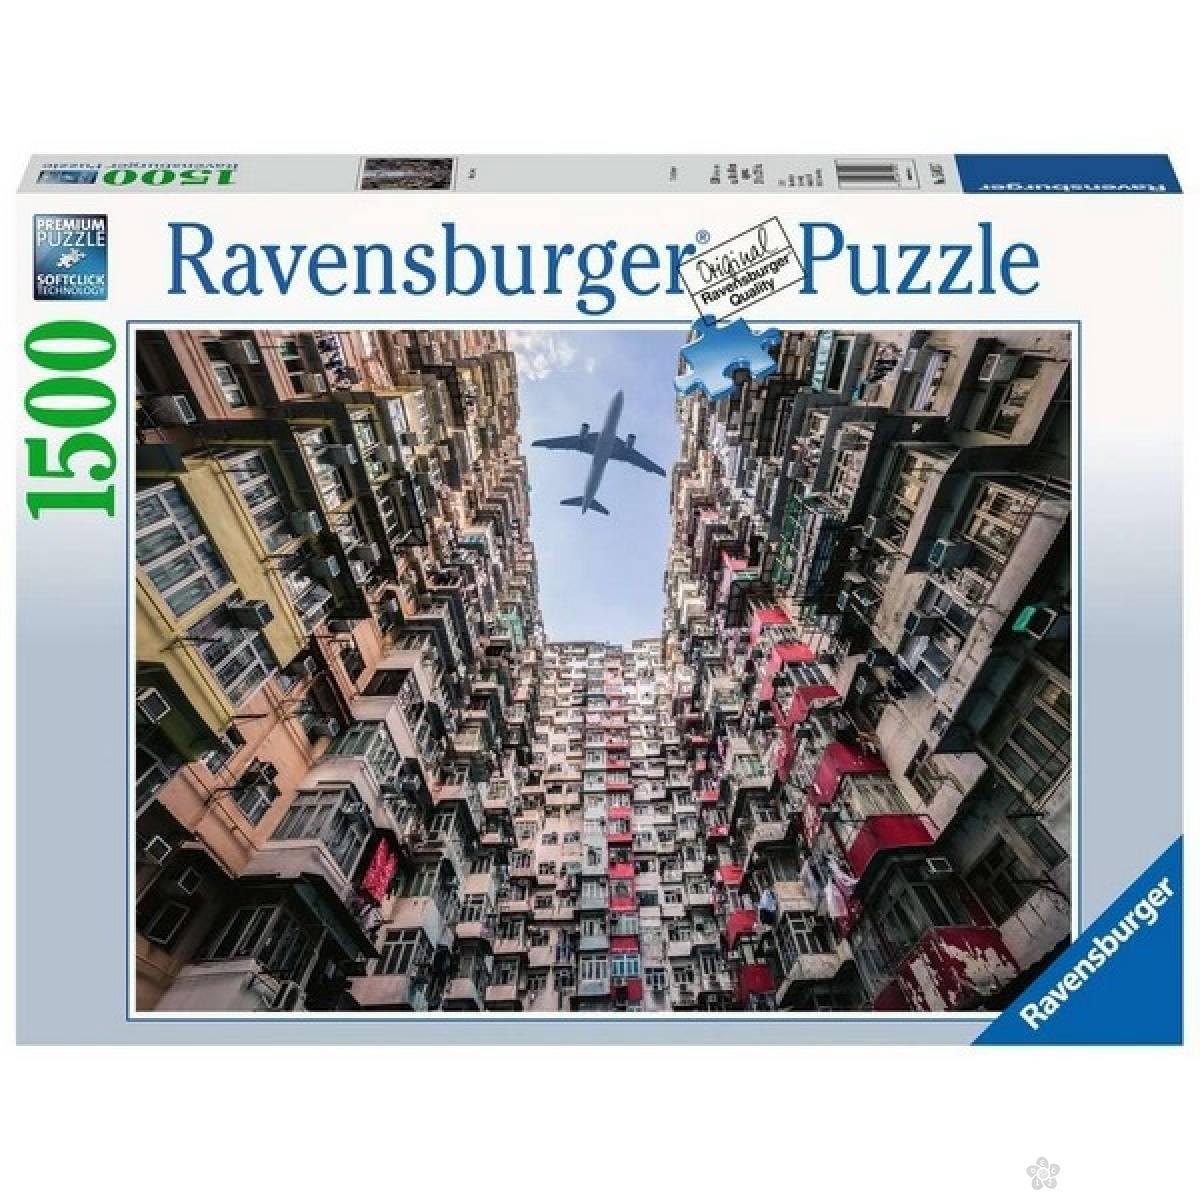 Ravensburger puzzle Uhvaćen momenat RA15013